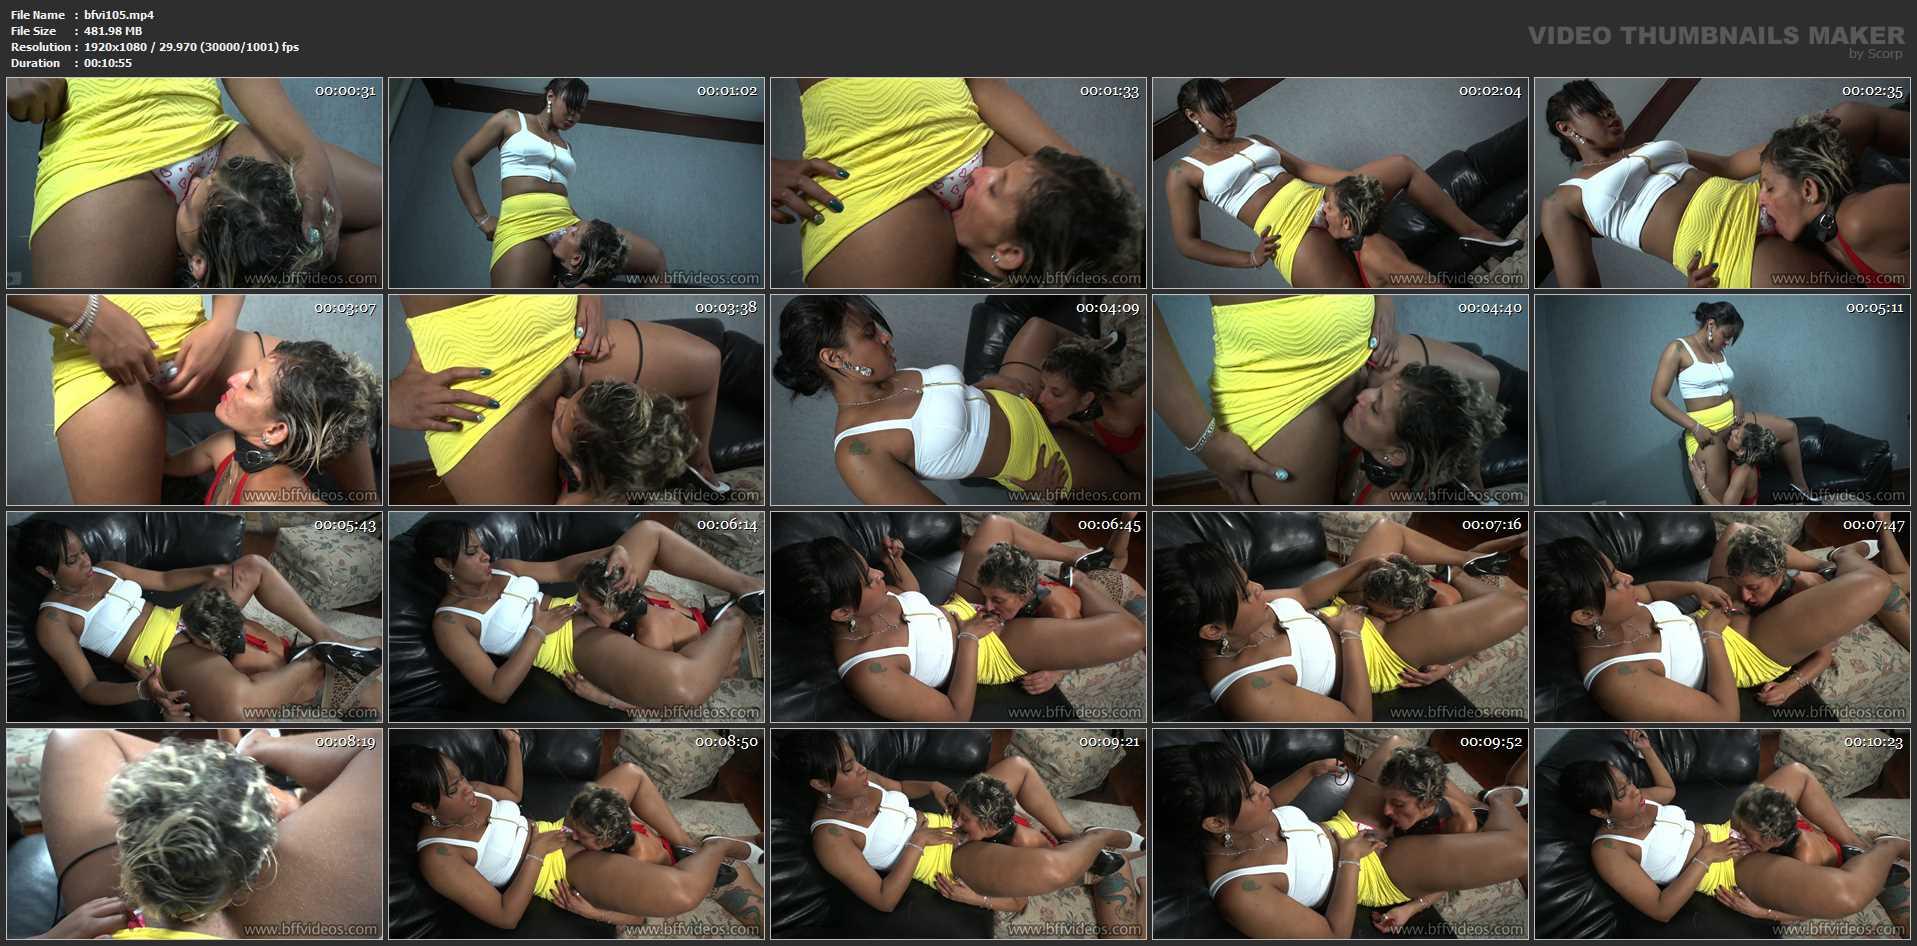 Goddess Angela In Scene: Angela Lesbian Domination Session - BFFVIDEOS - FULL HD/1080p/MP4